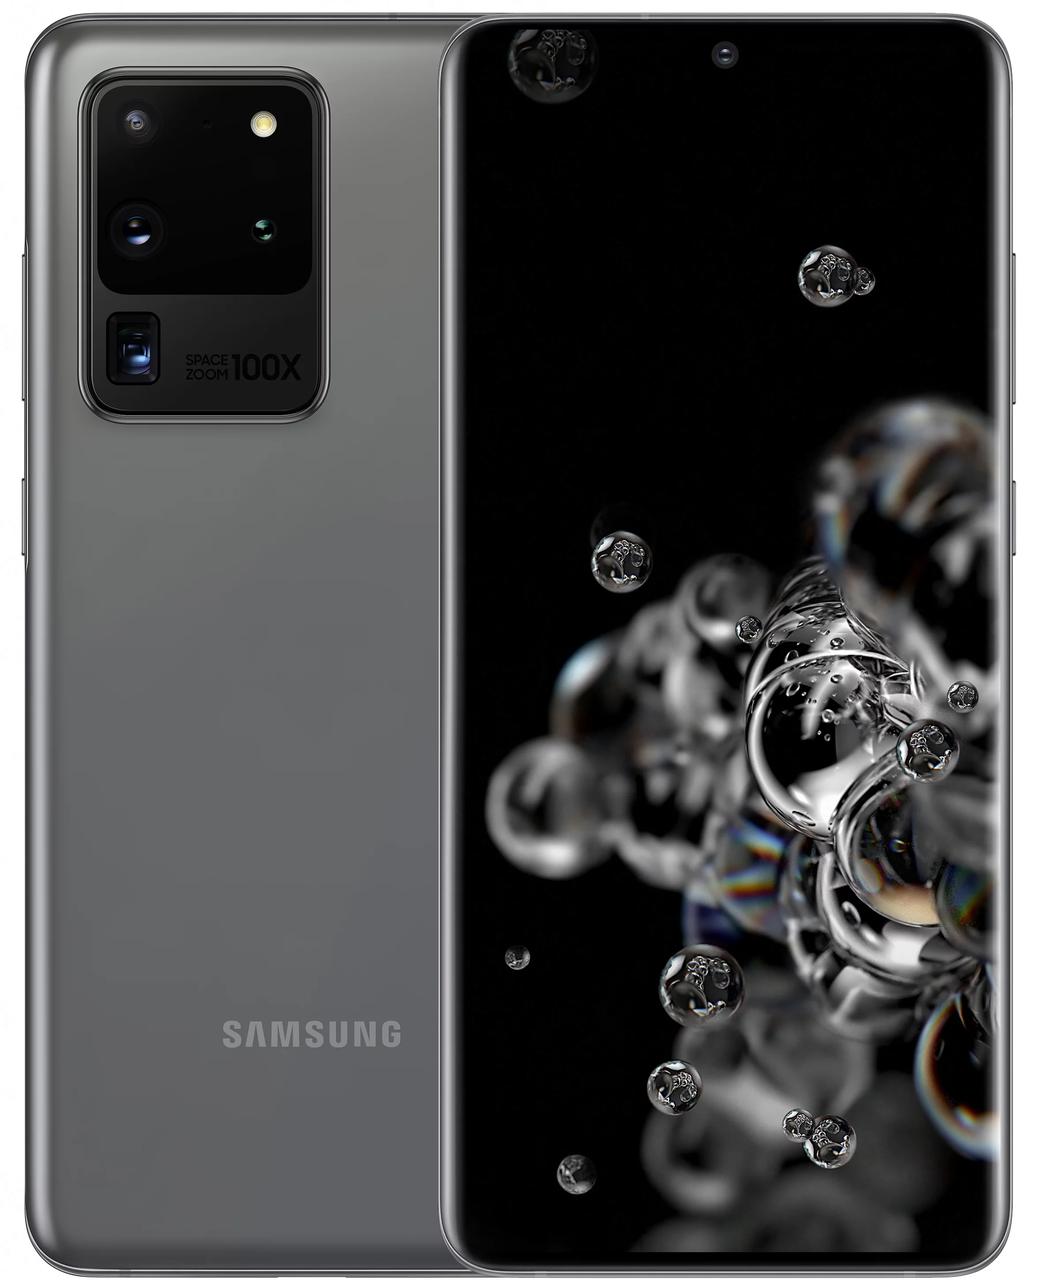 Смартфон Samsung Galaxy S20 Ultra 2020 G988B 12/128Gb Cosmic Gray (SM-G988BZADSEK) UA